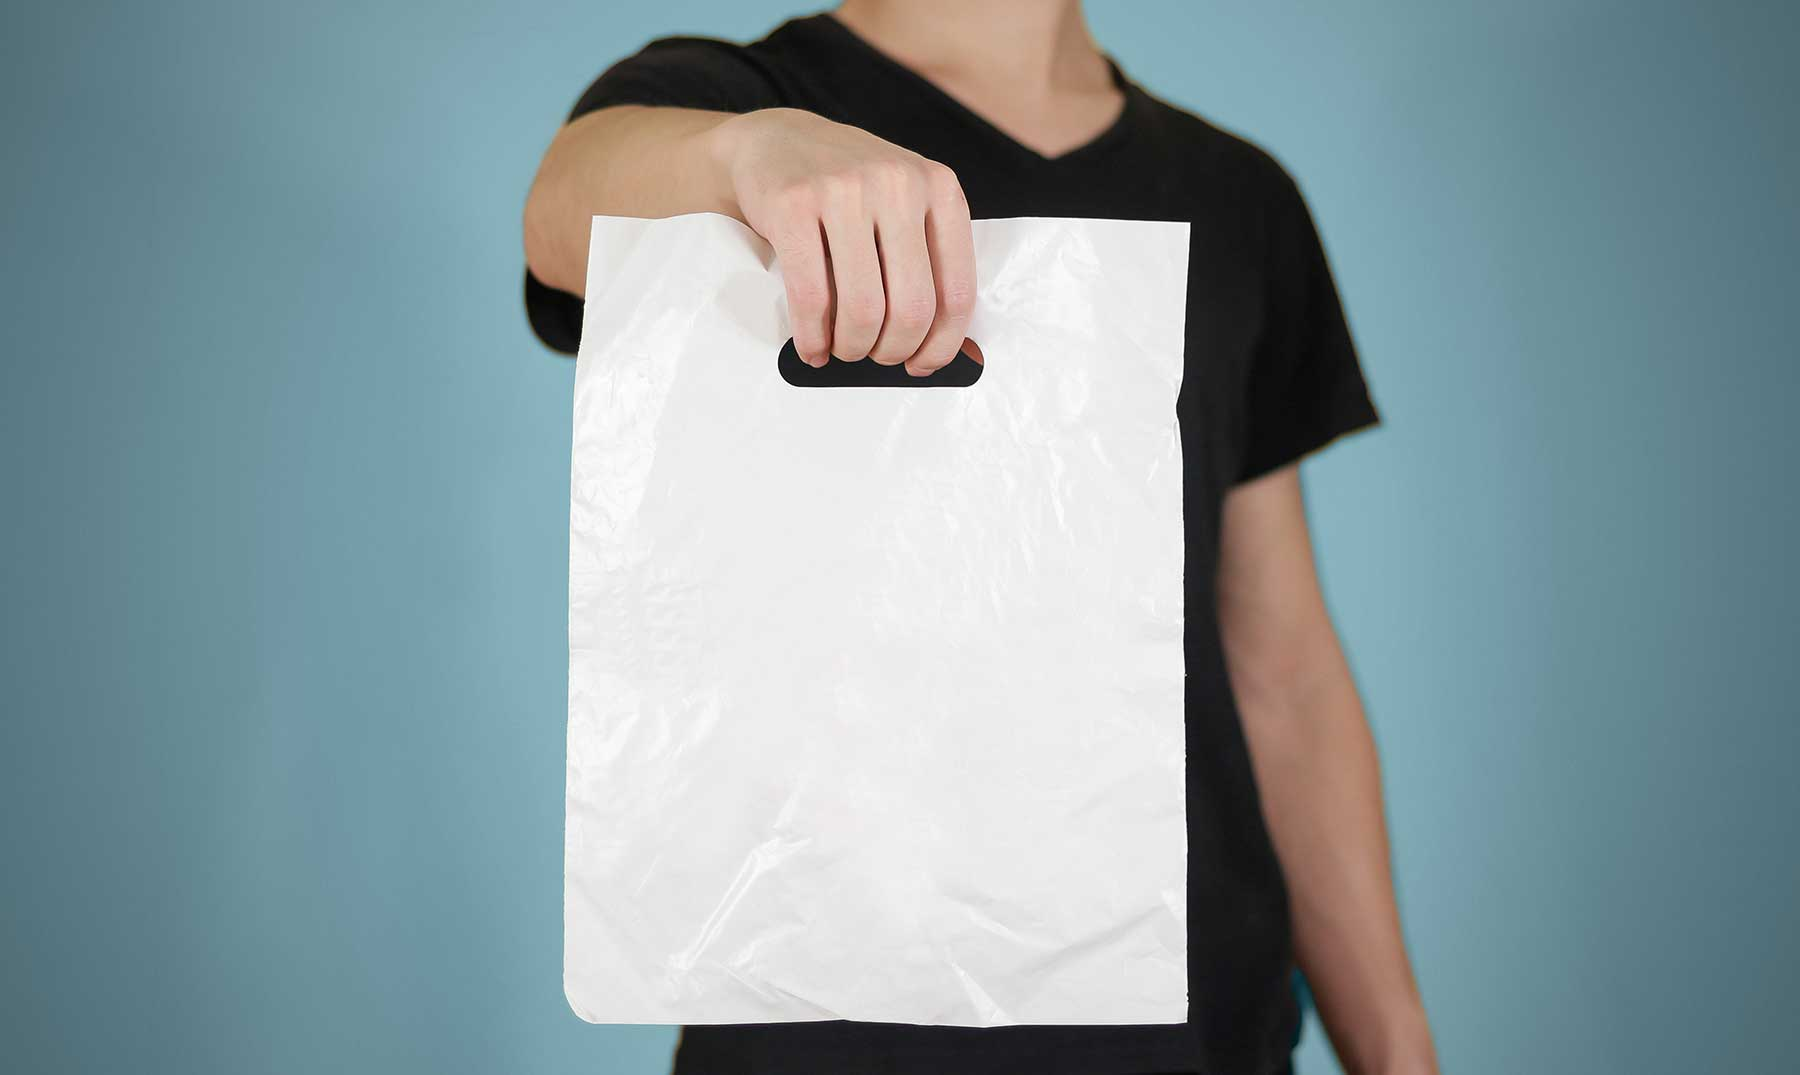 Bolsas plásticas biodegradables ¿qué son?